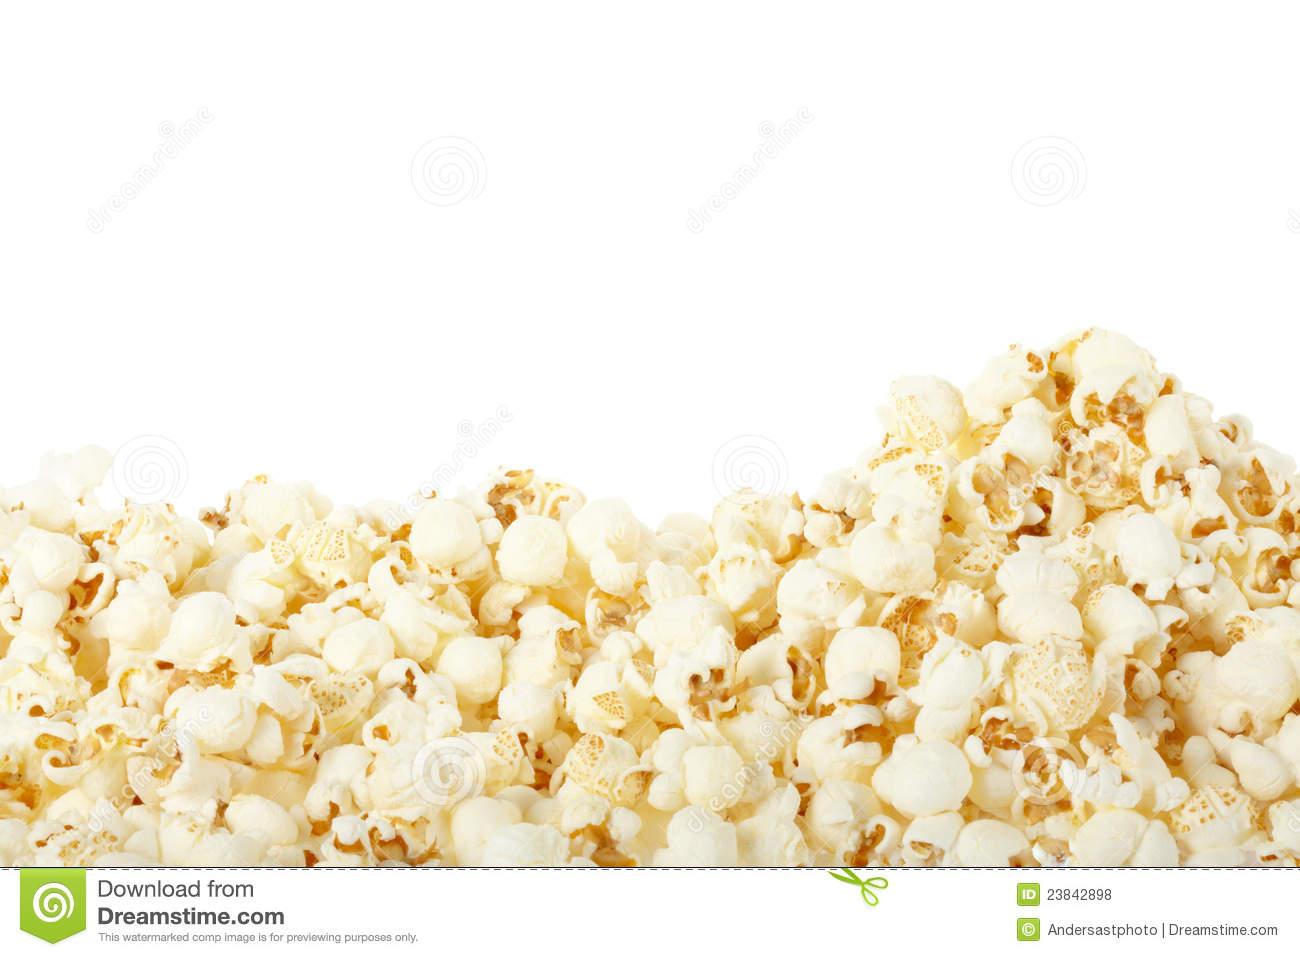 popcorn border clipart clipart suggest Theater Lights Border movie theater clipart borders